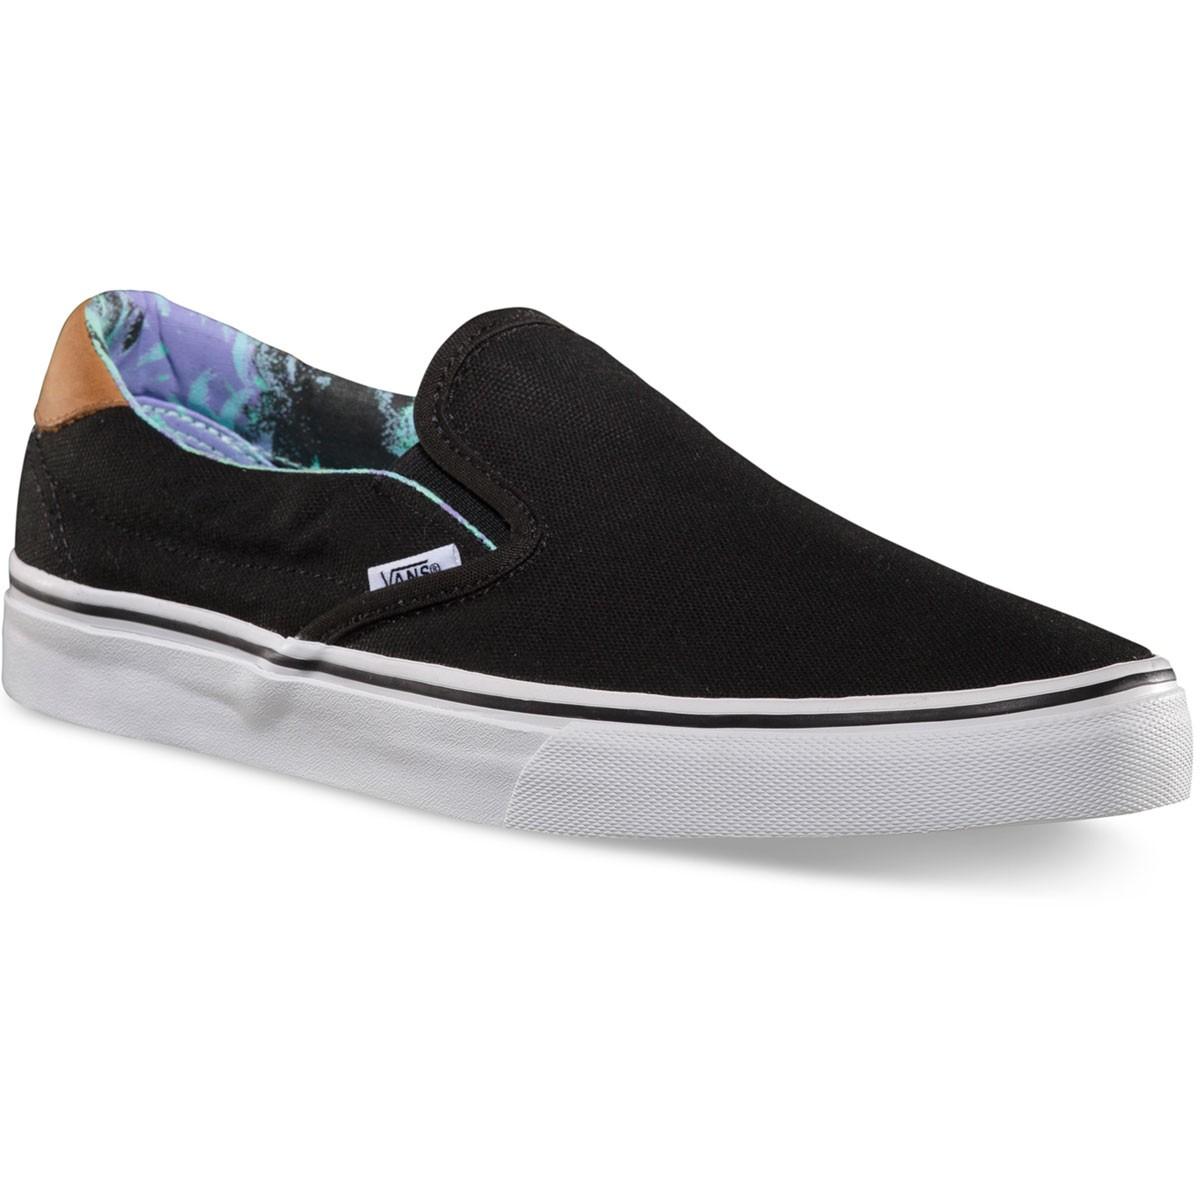 33972fc84 Slip On Beach Shoes - Blitz Weekly